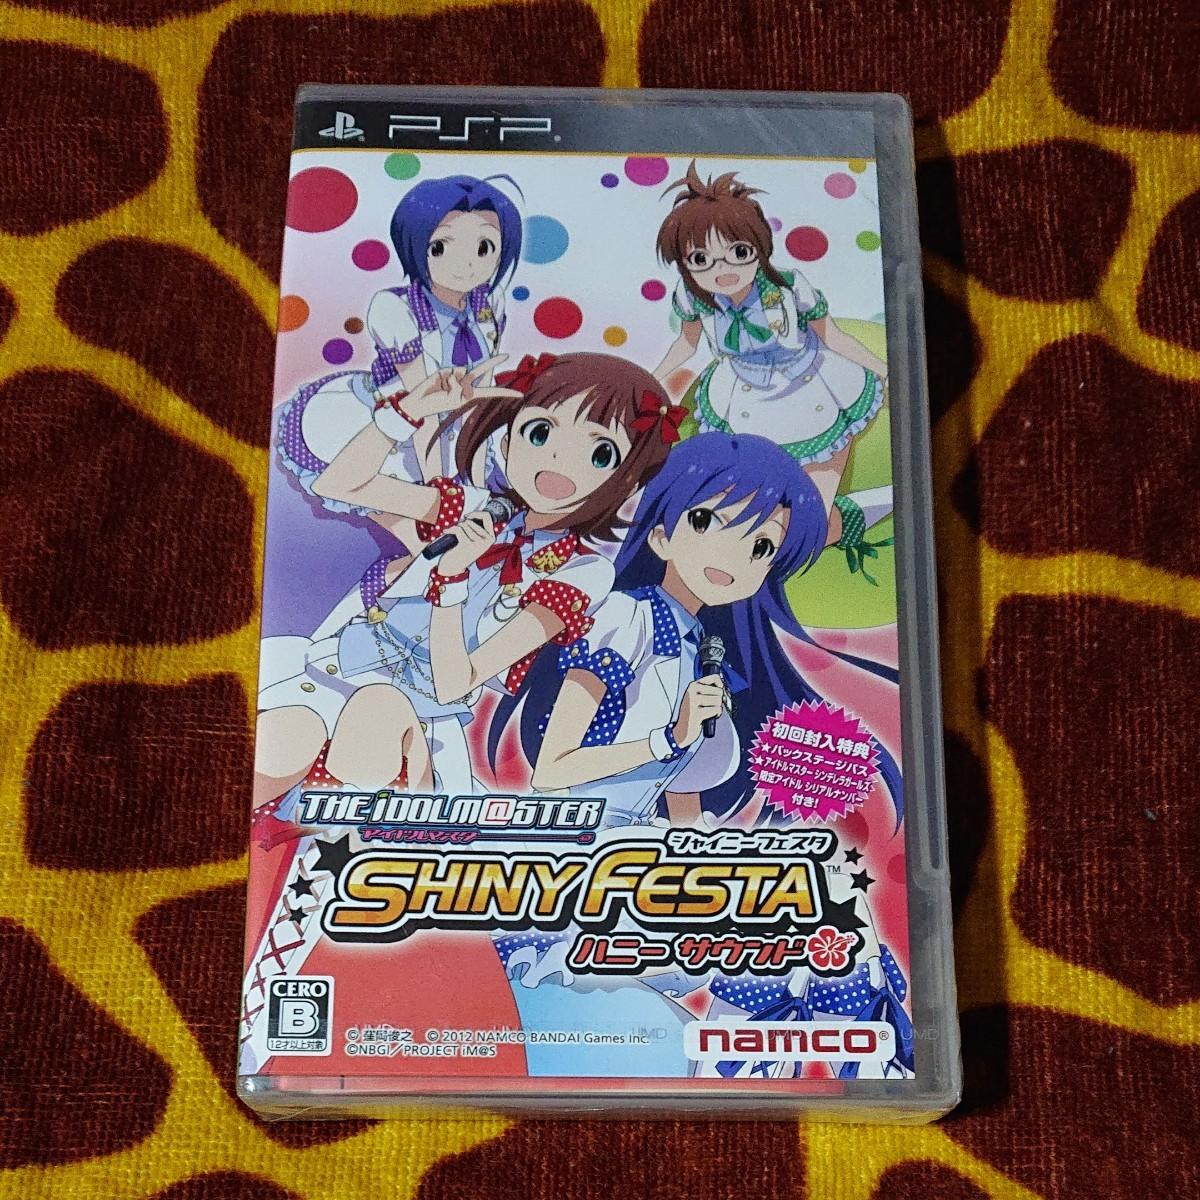 【PSP】アイドルマスター シャイニーフェスタ ハニーサウンド